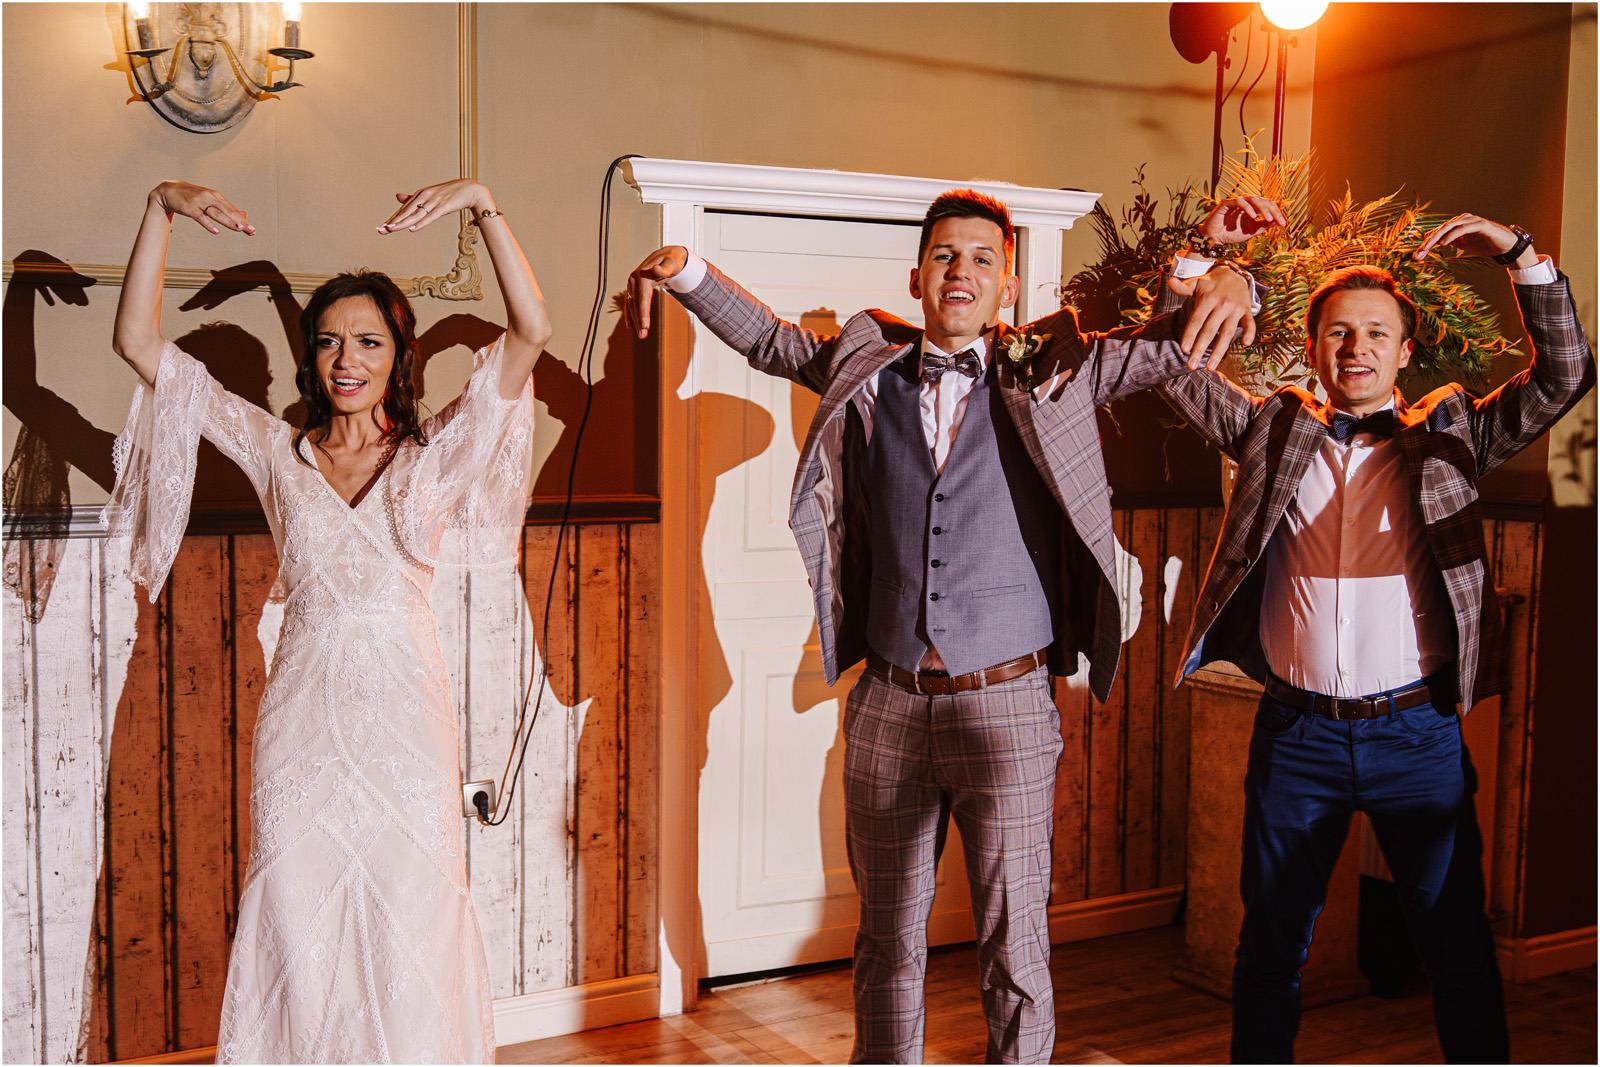 Ania & Mateusz | boho wesele w Stodole pod Kasztanami 109